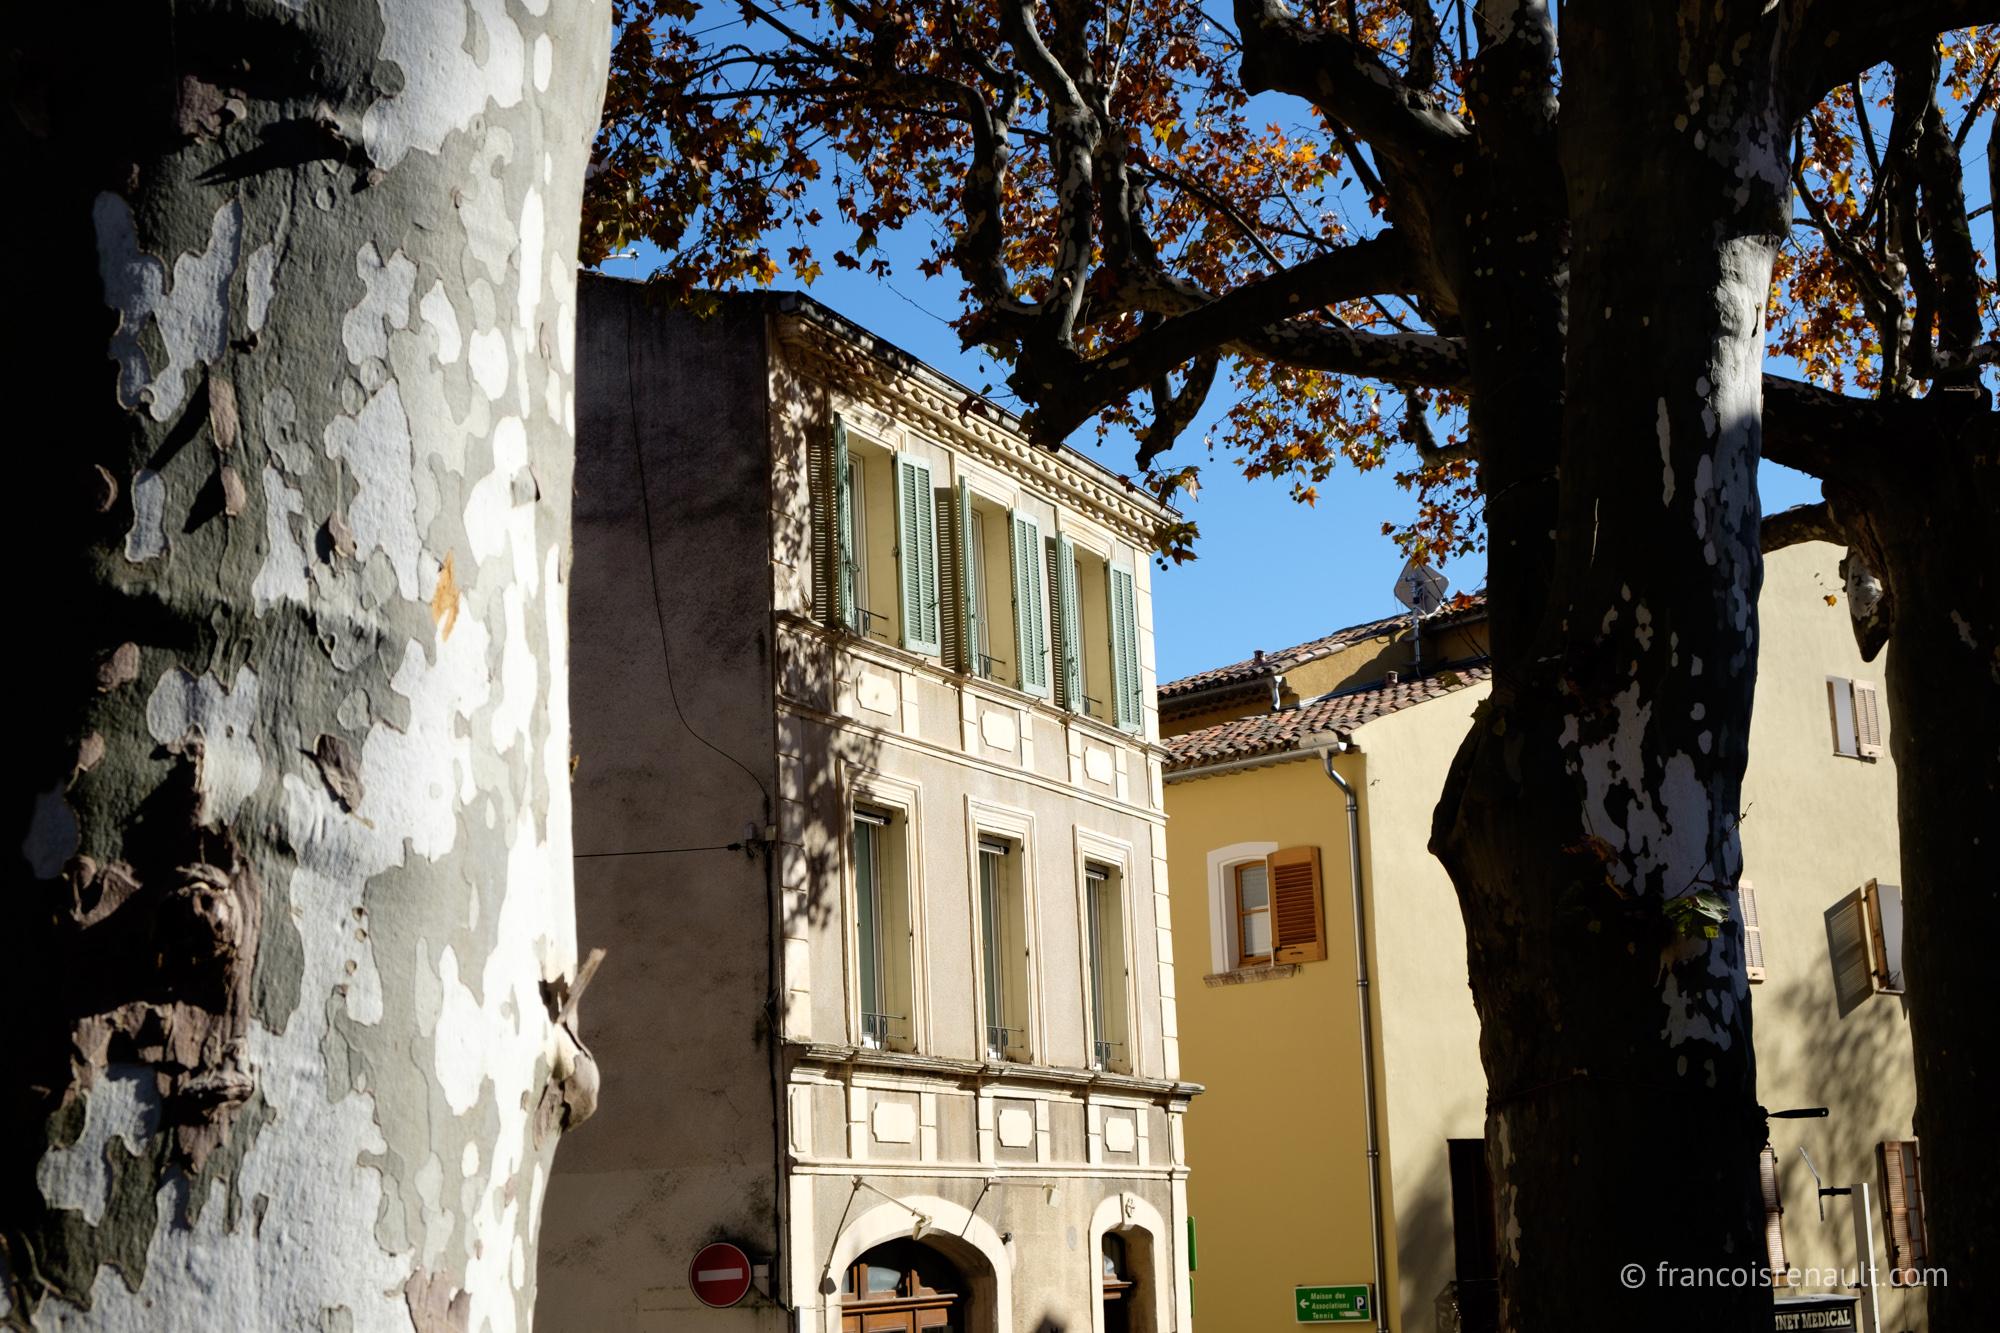 Villecroze, Haut Var, Provence, France.